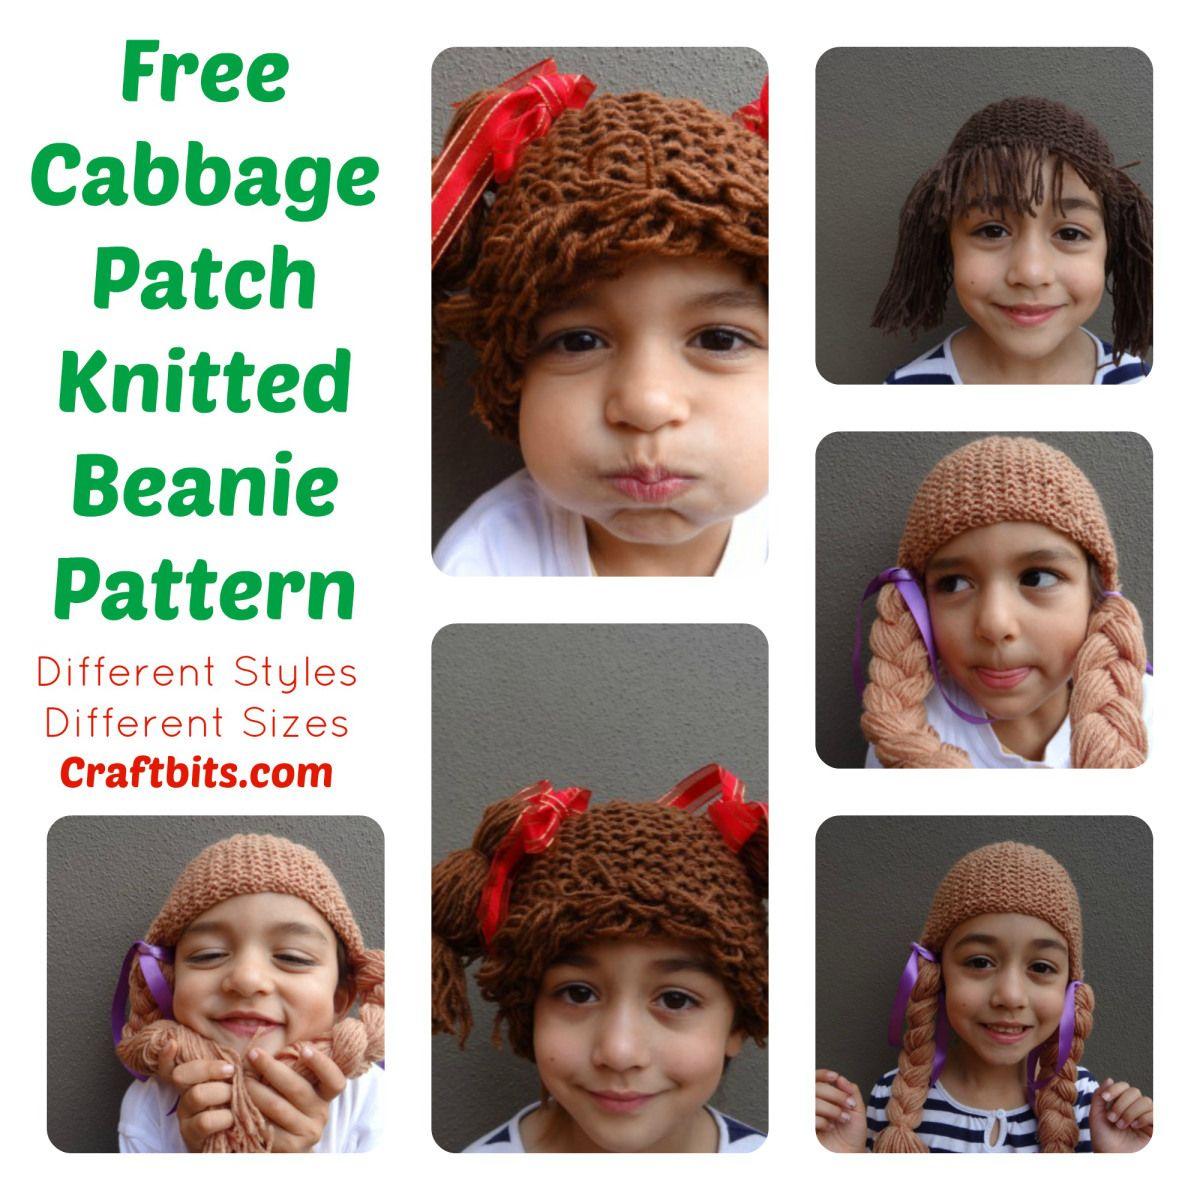 Cabbage Patch Hat Crochet Pattern Free Best Design